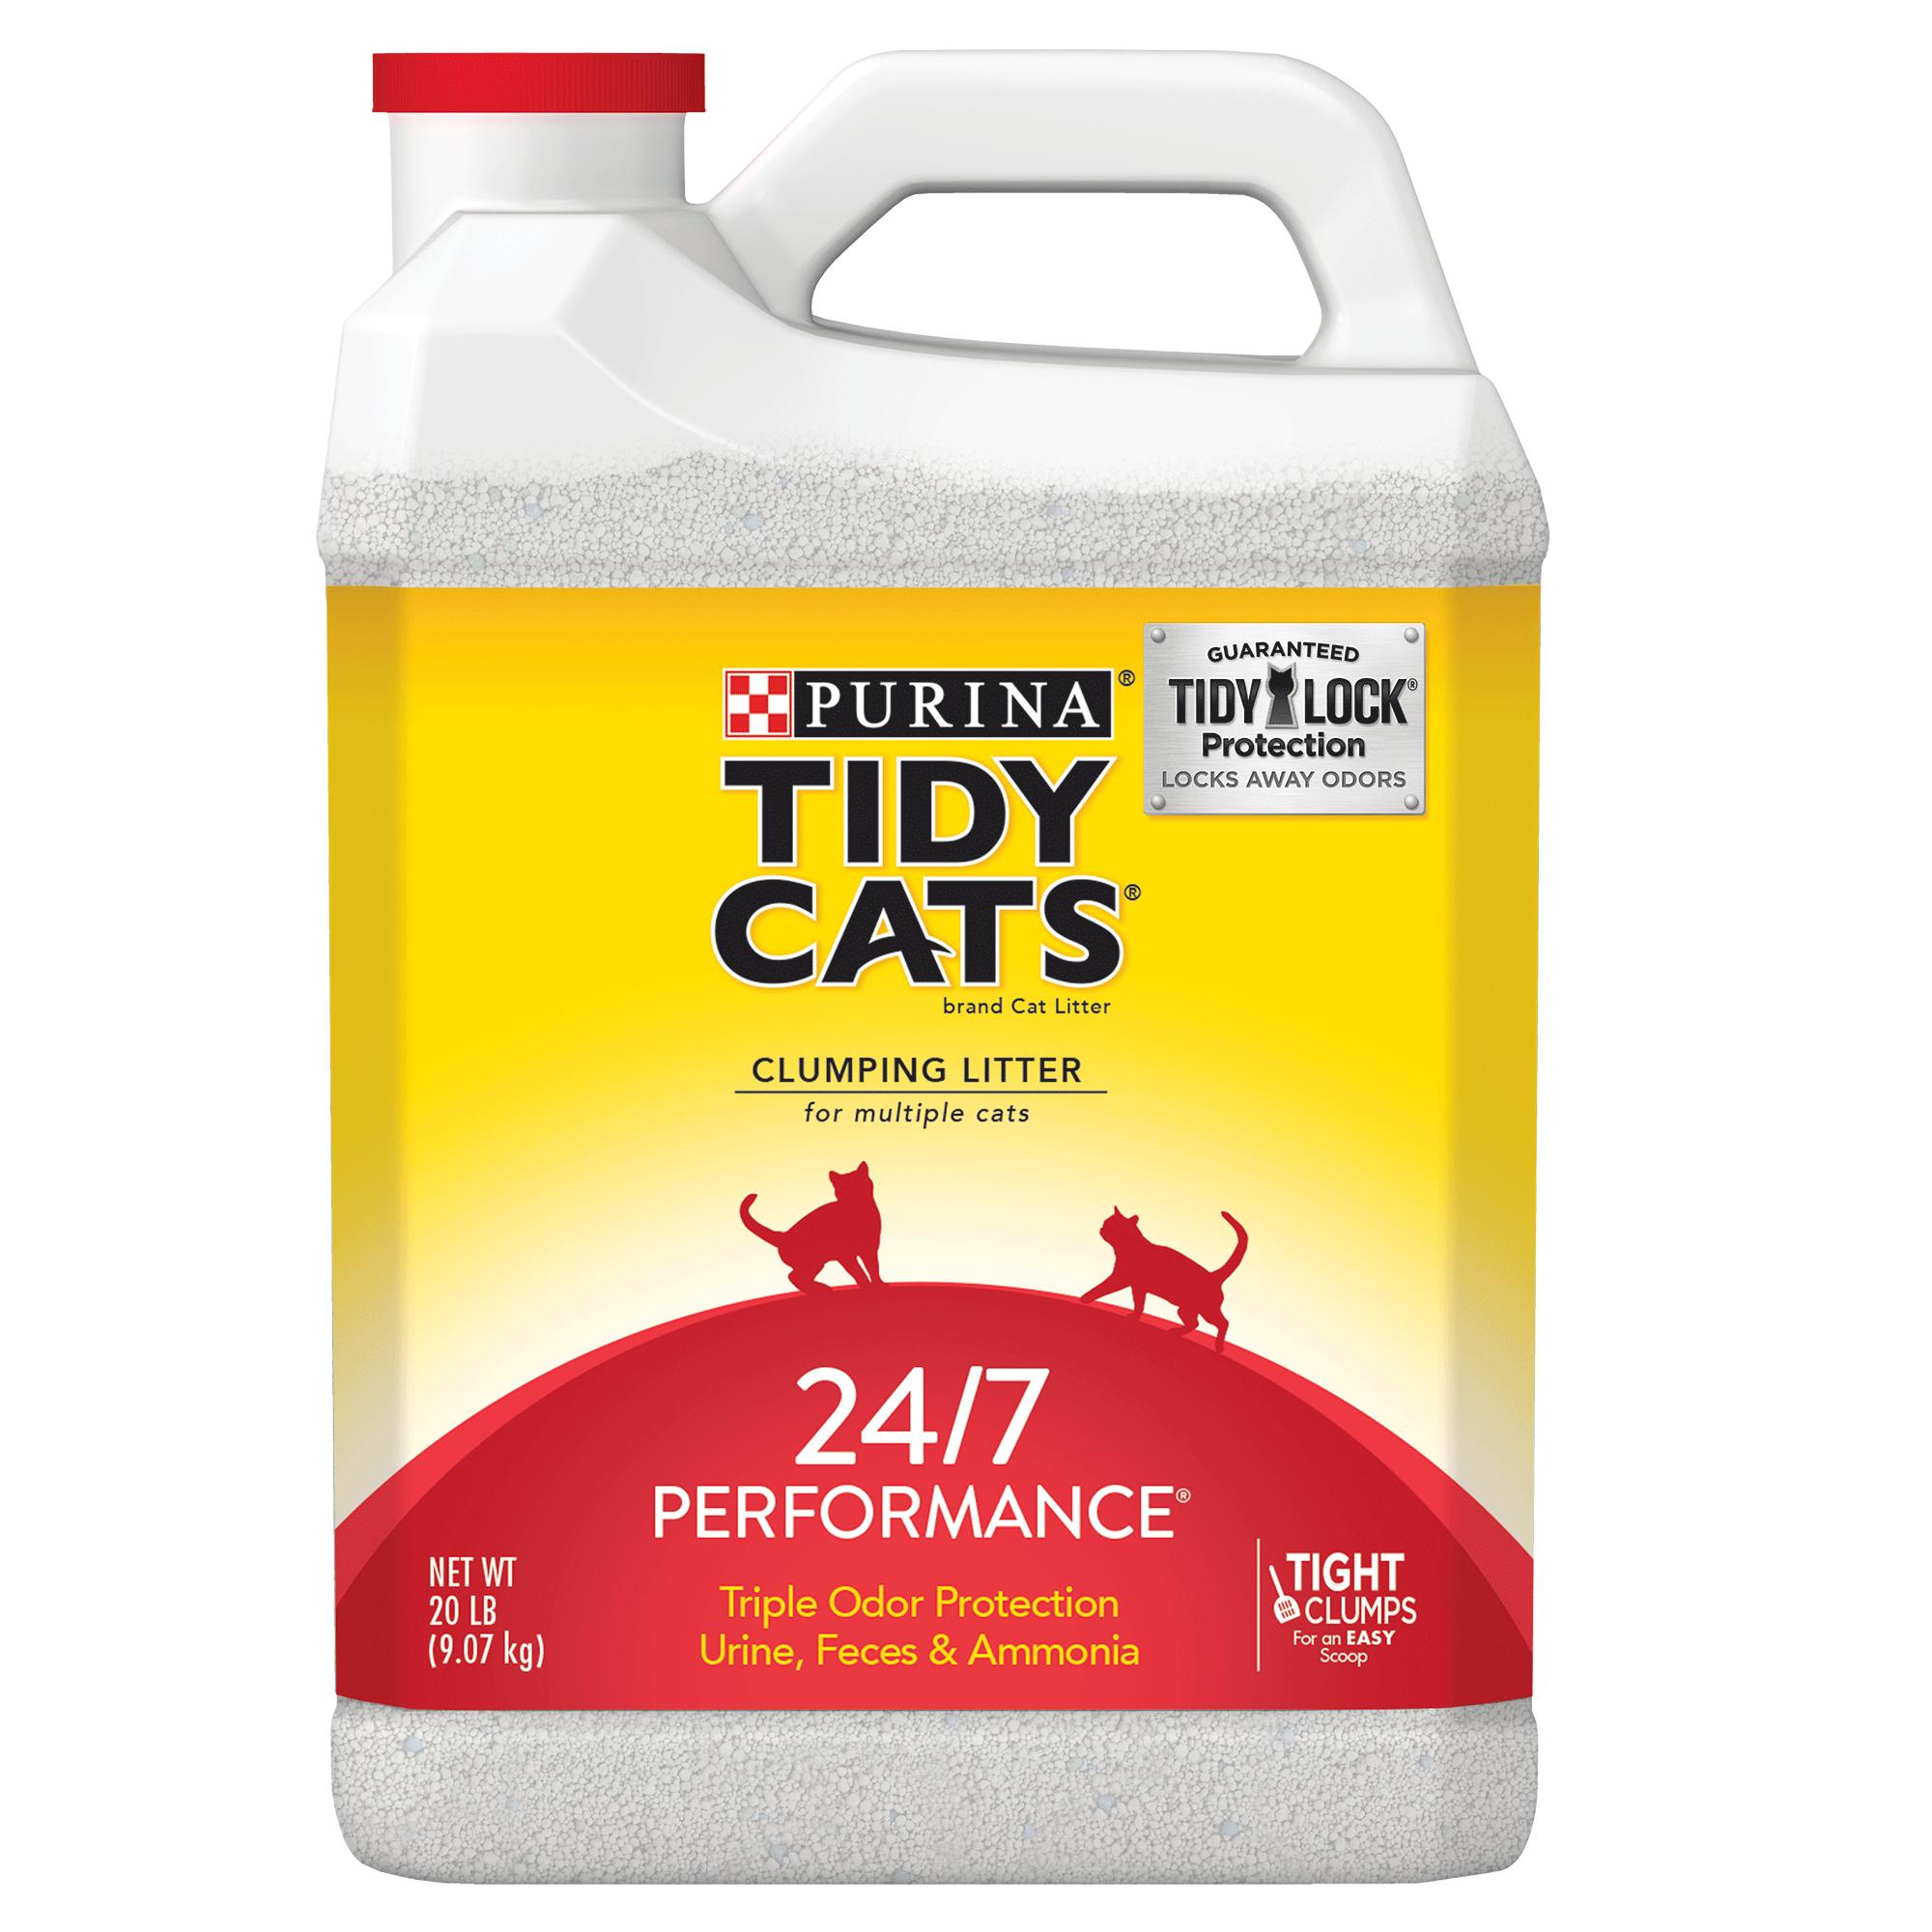 Purina Tidy Cats 24/7 Performance Clumping Cat Litter, 20-lb Jug